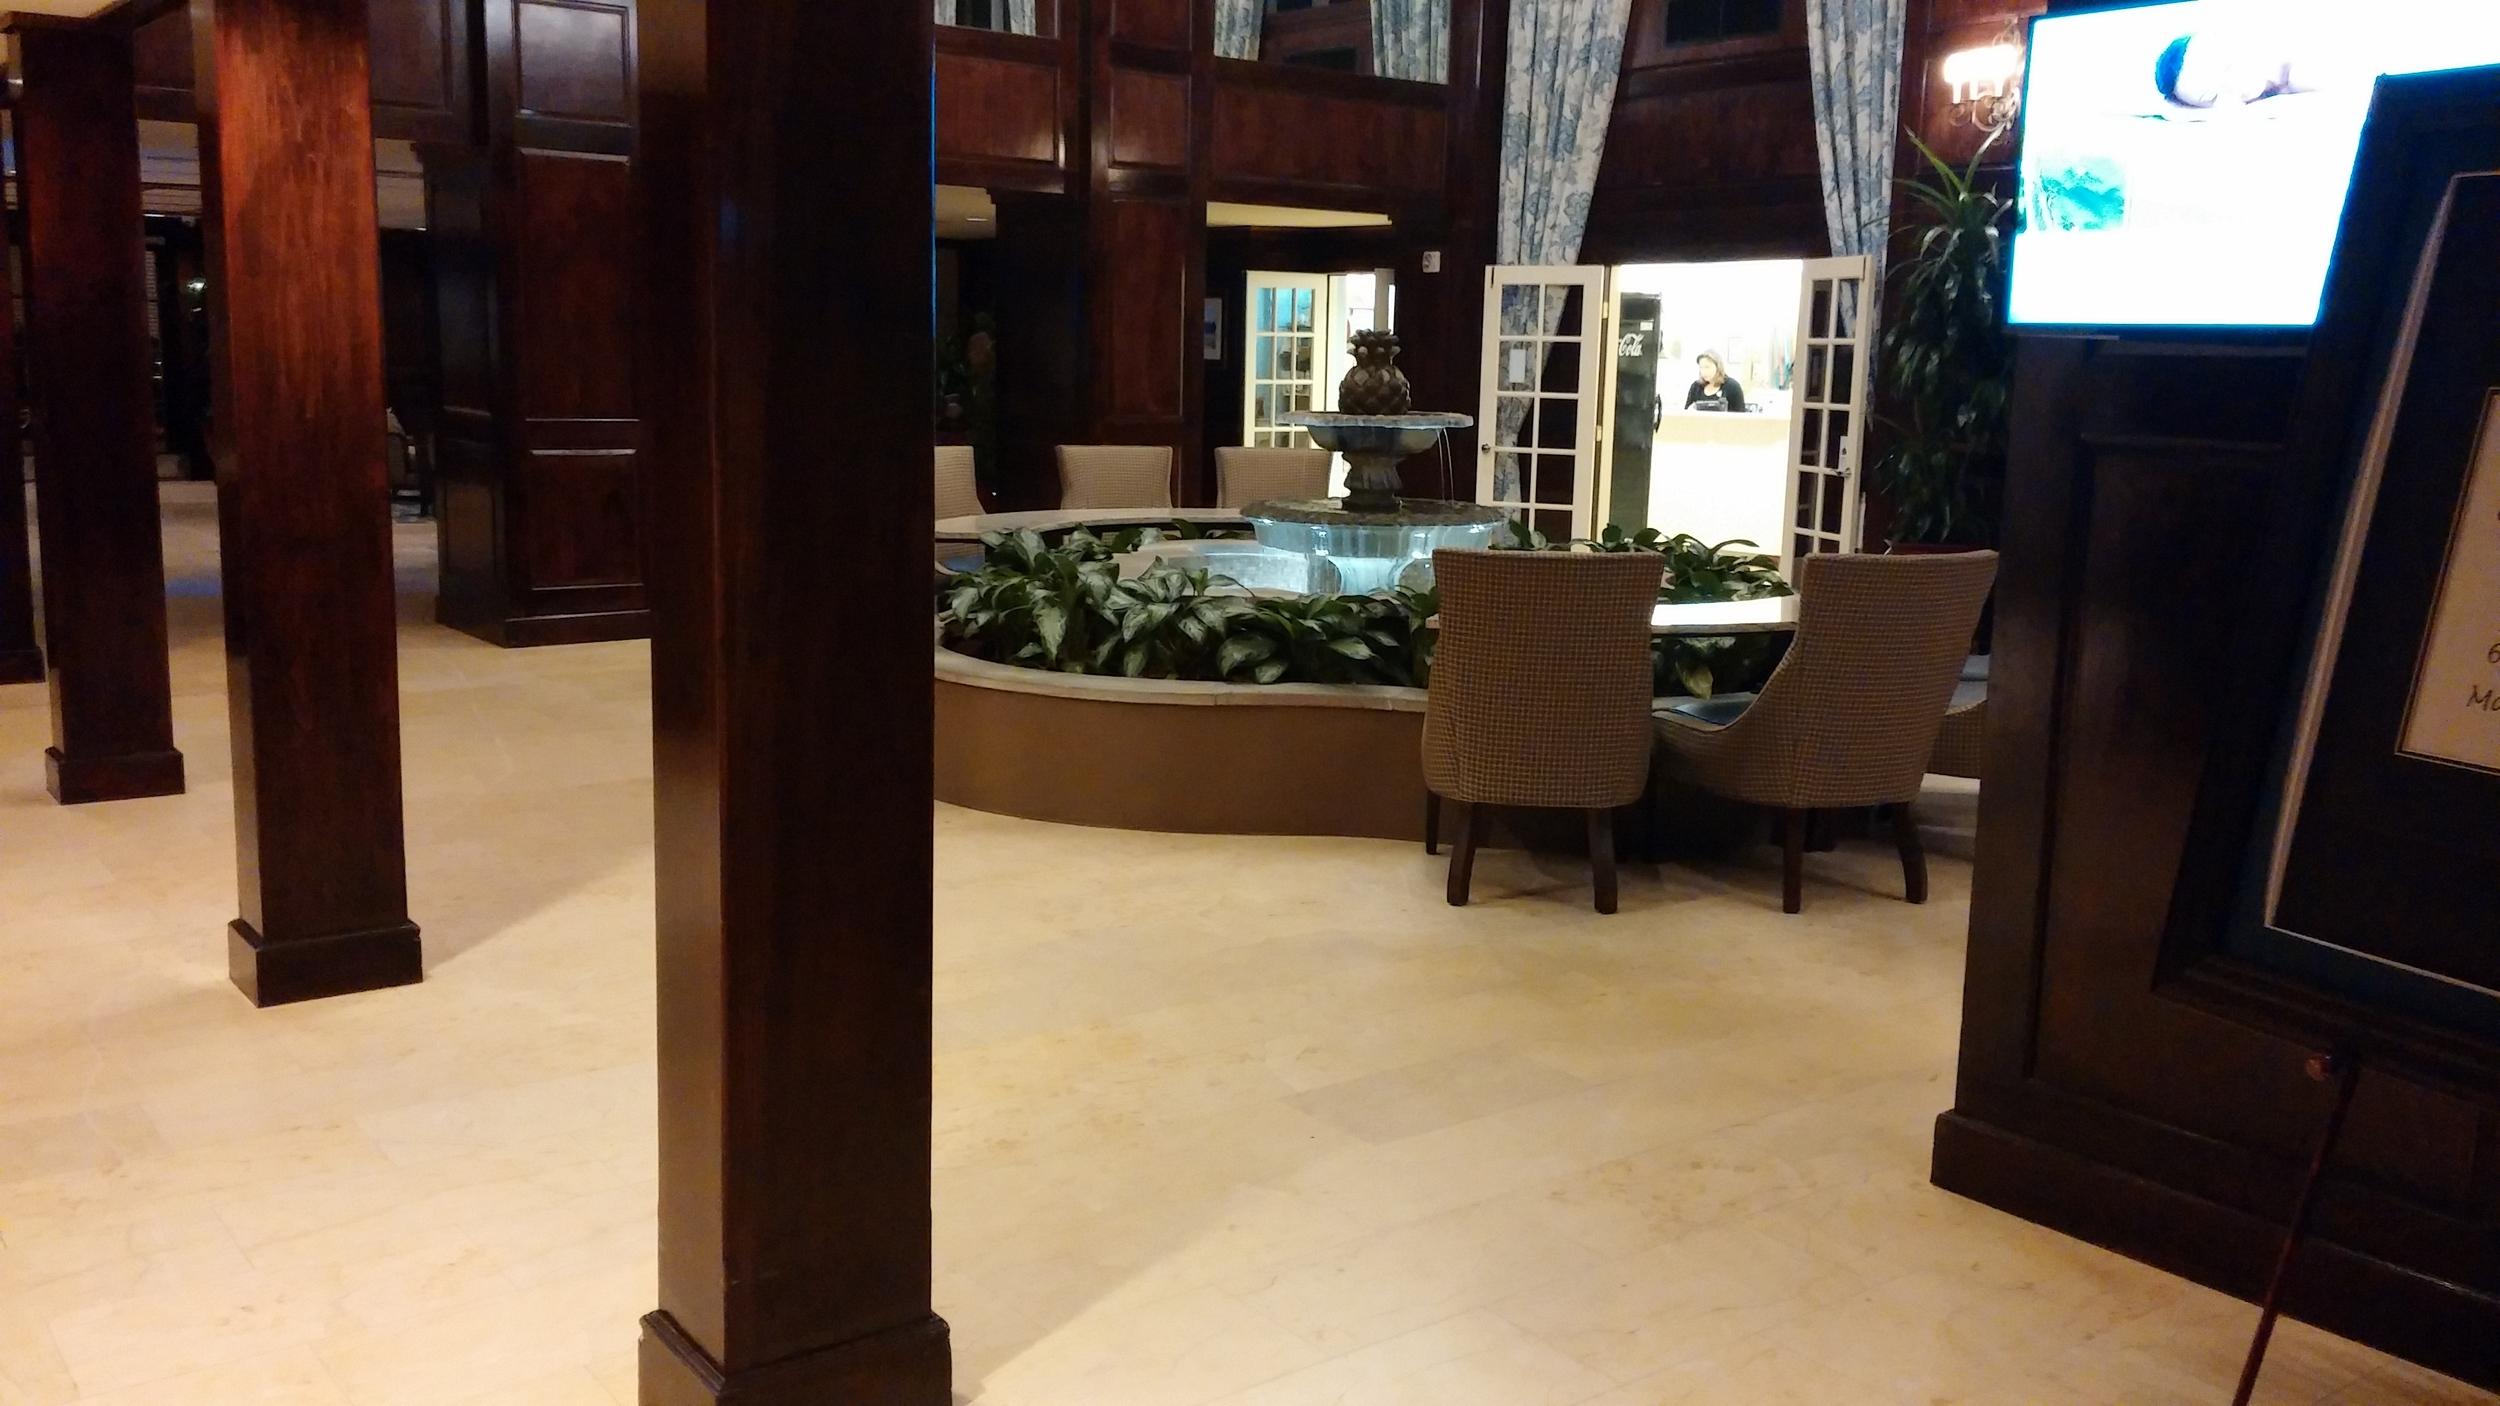 2016-01-08 The Shores Resort and Spa, Daytona Beach FL 12.jpg